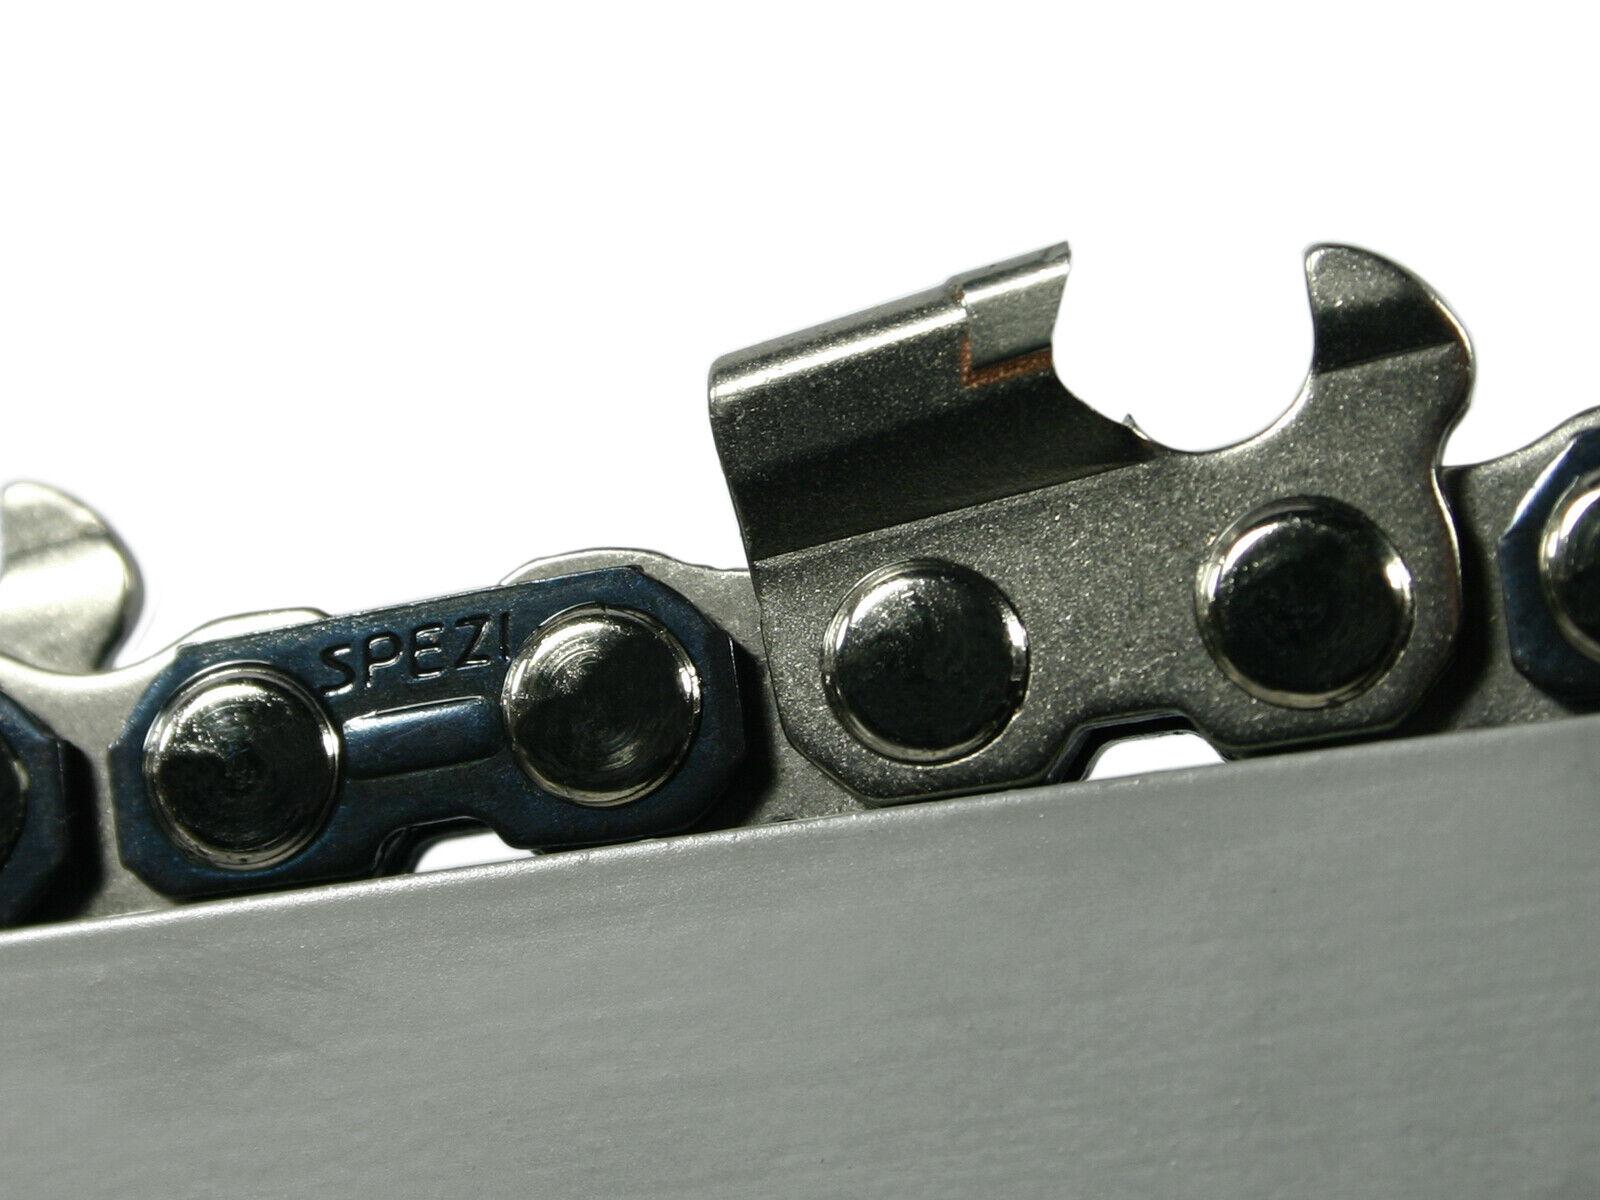 Metal duro cadena sierra adecuado para Husqvarna 66 90 cm 3 8  115 TG 1,6 mm Cochebide